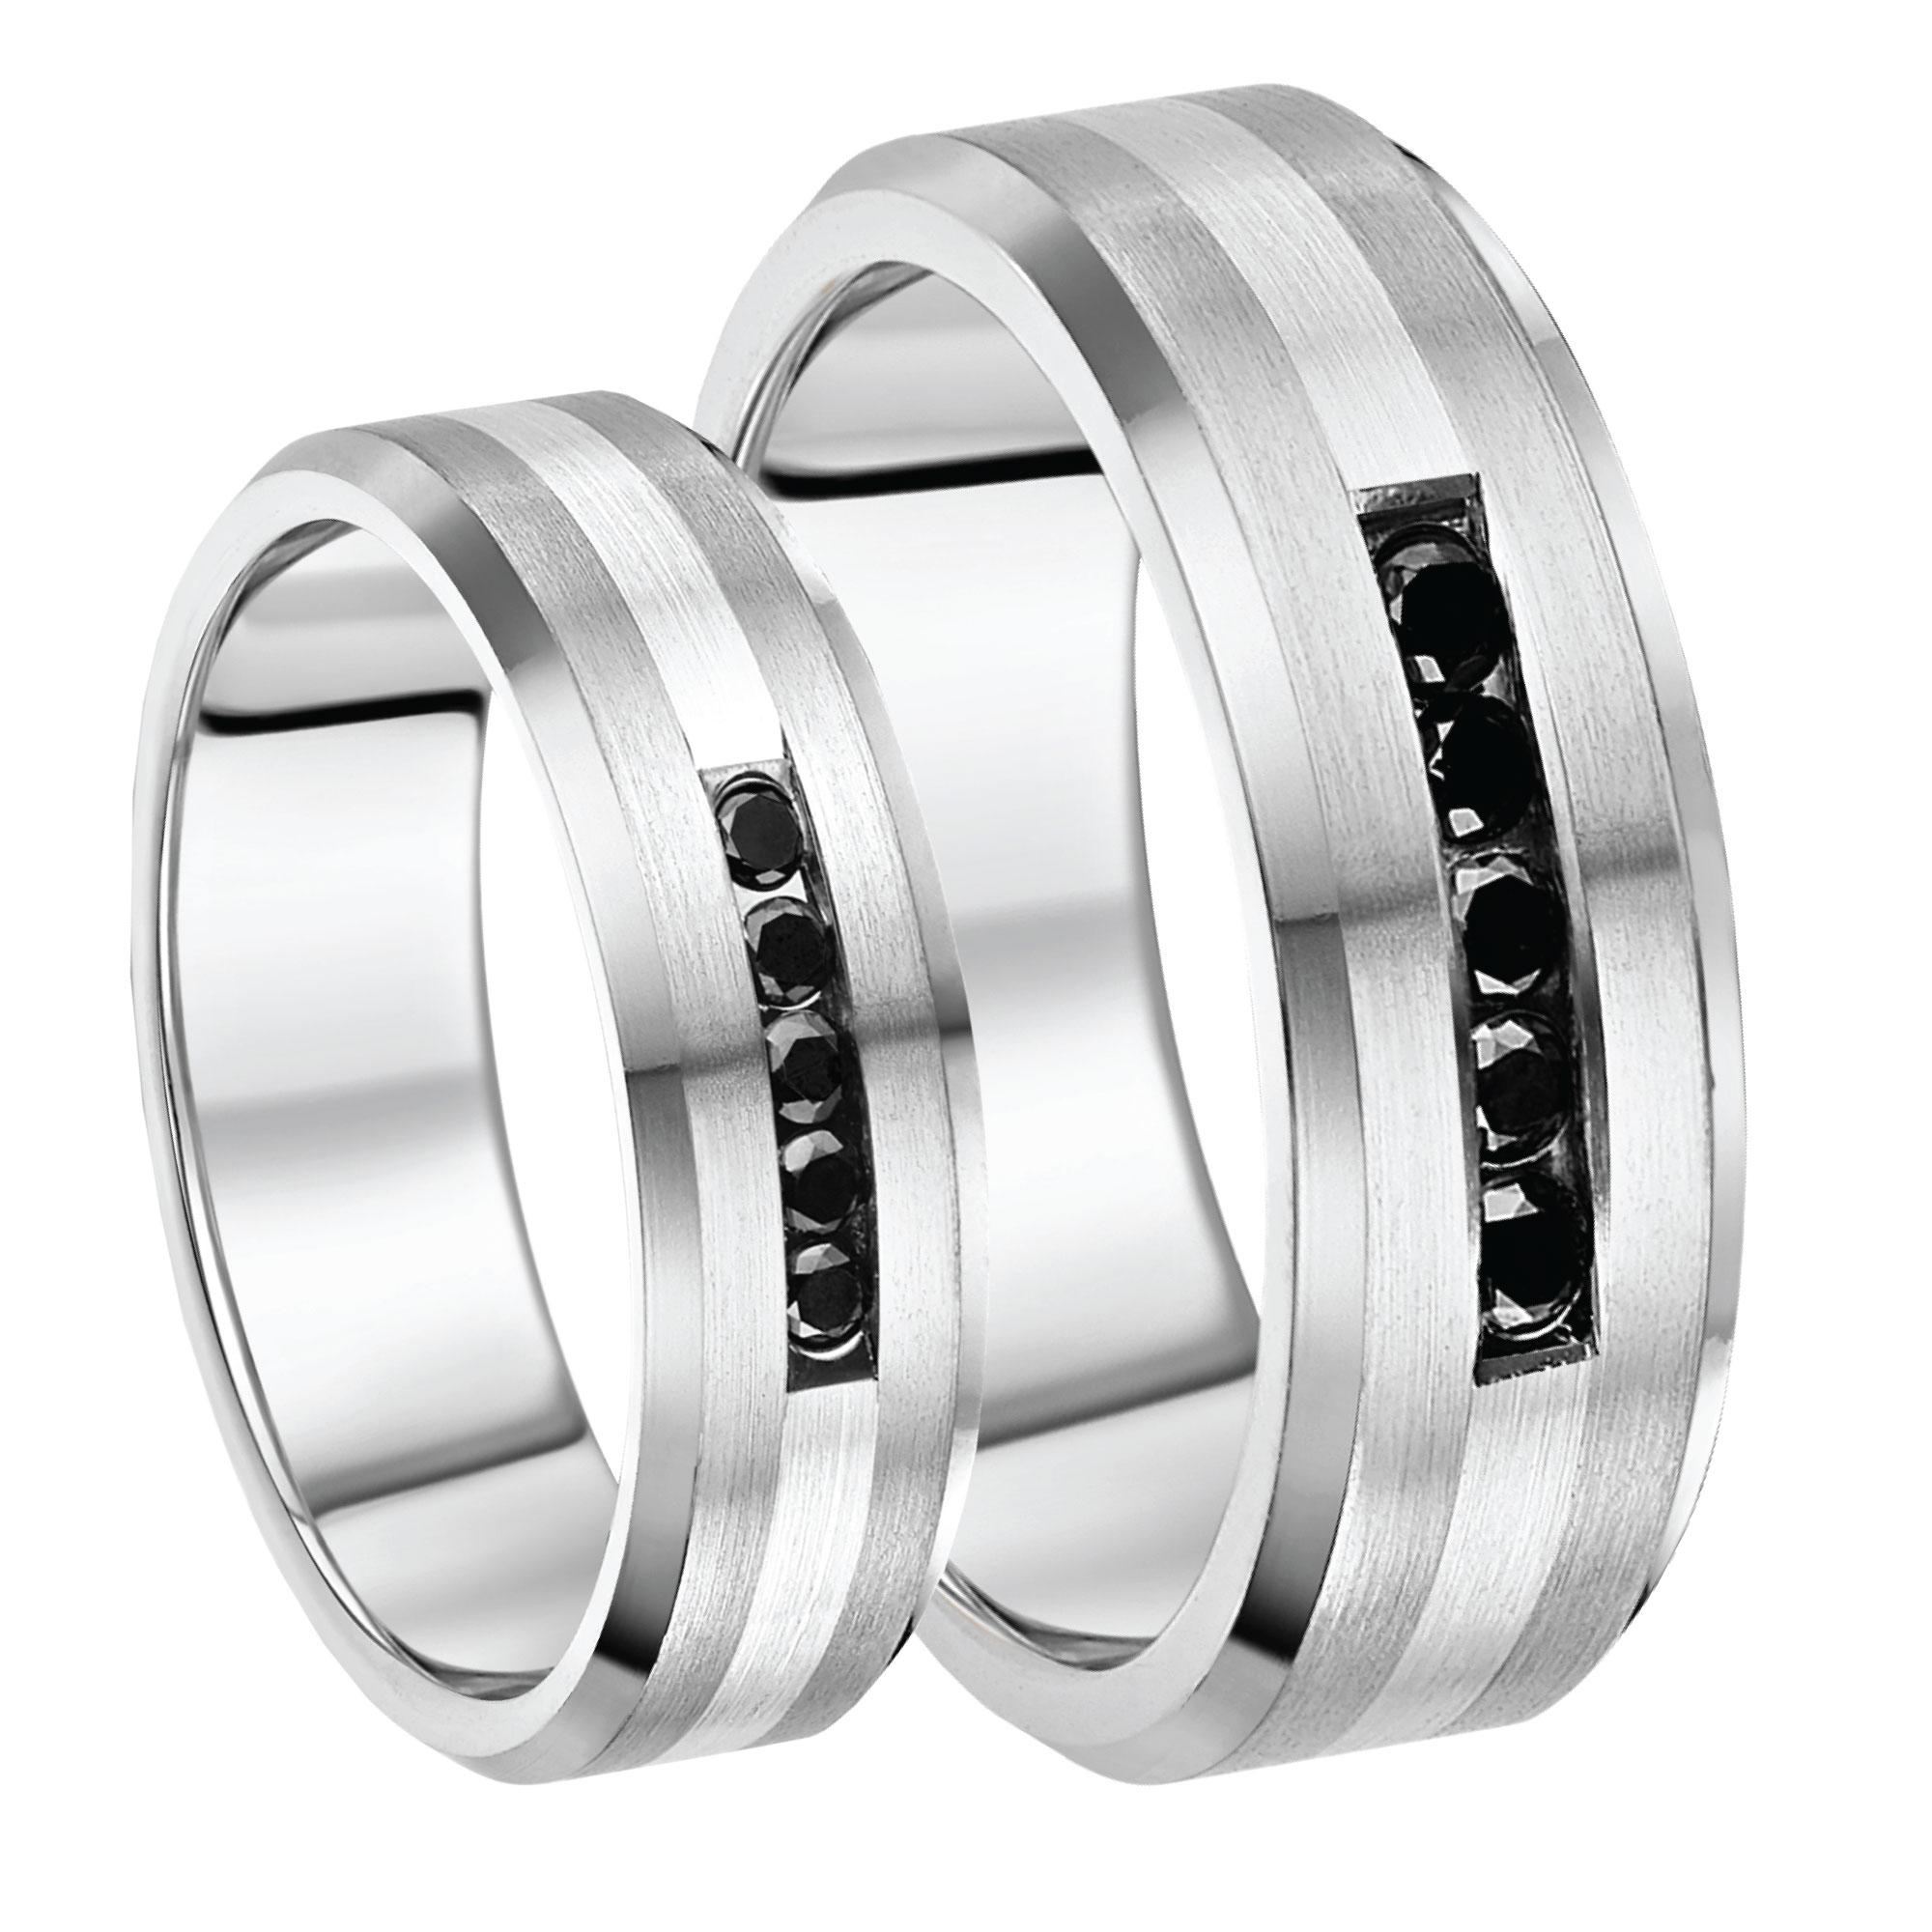 5 7mm Titanium Sterling Silver Black Diamond Wedding Rings